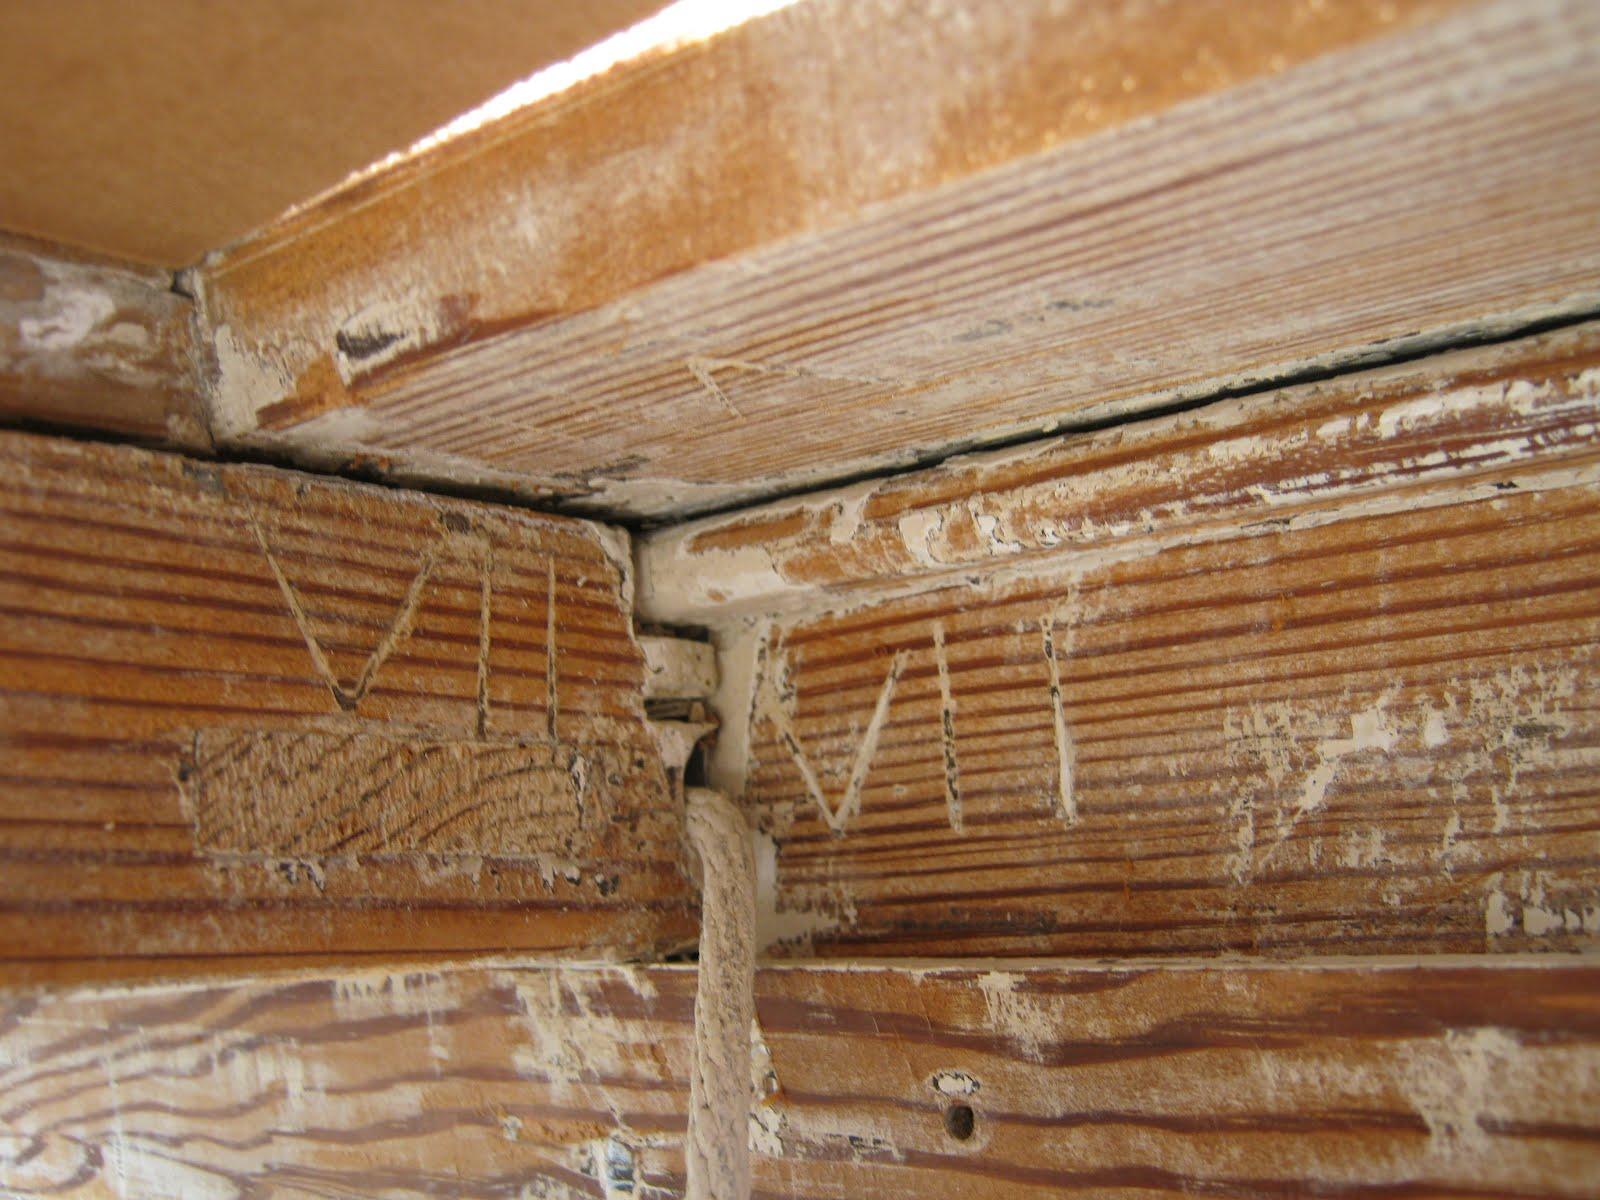 preservation virginia's blog: bacon's castle winter spruce up-2012